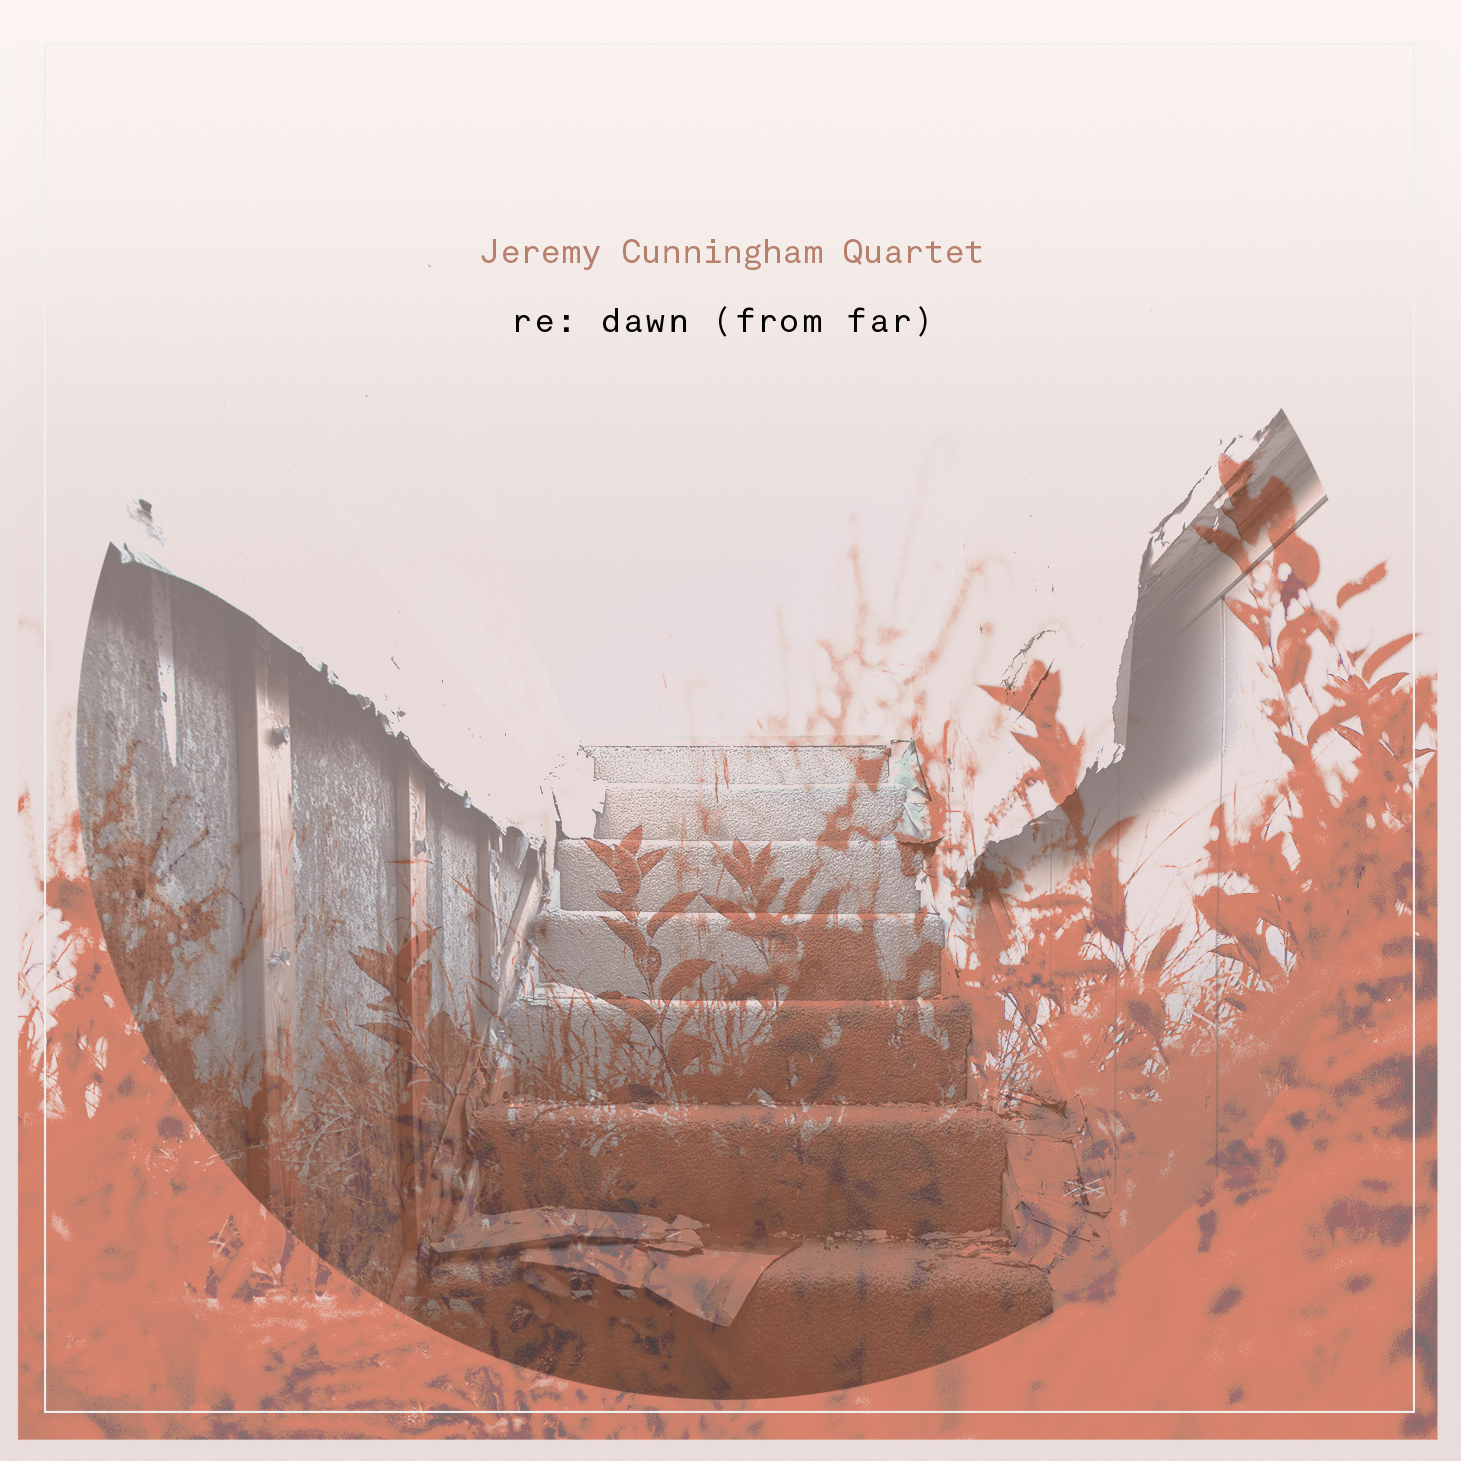 Jeremy Cunningham Quartet | re: dawn (from far)   buy:  MP3   CD   BandCamp   iTunes   Amazon